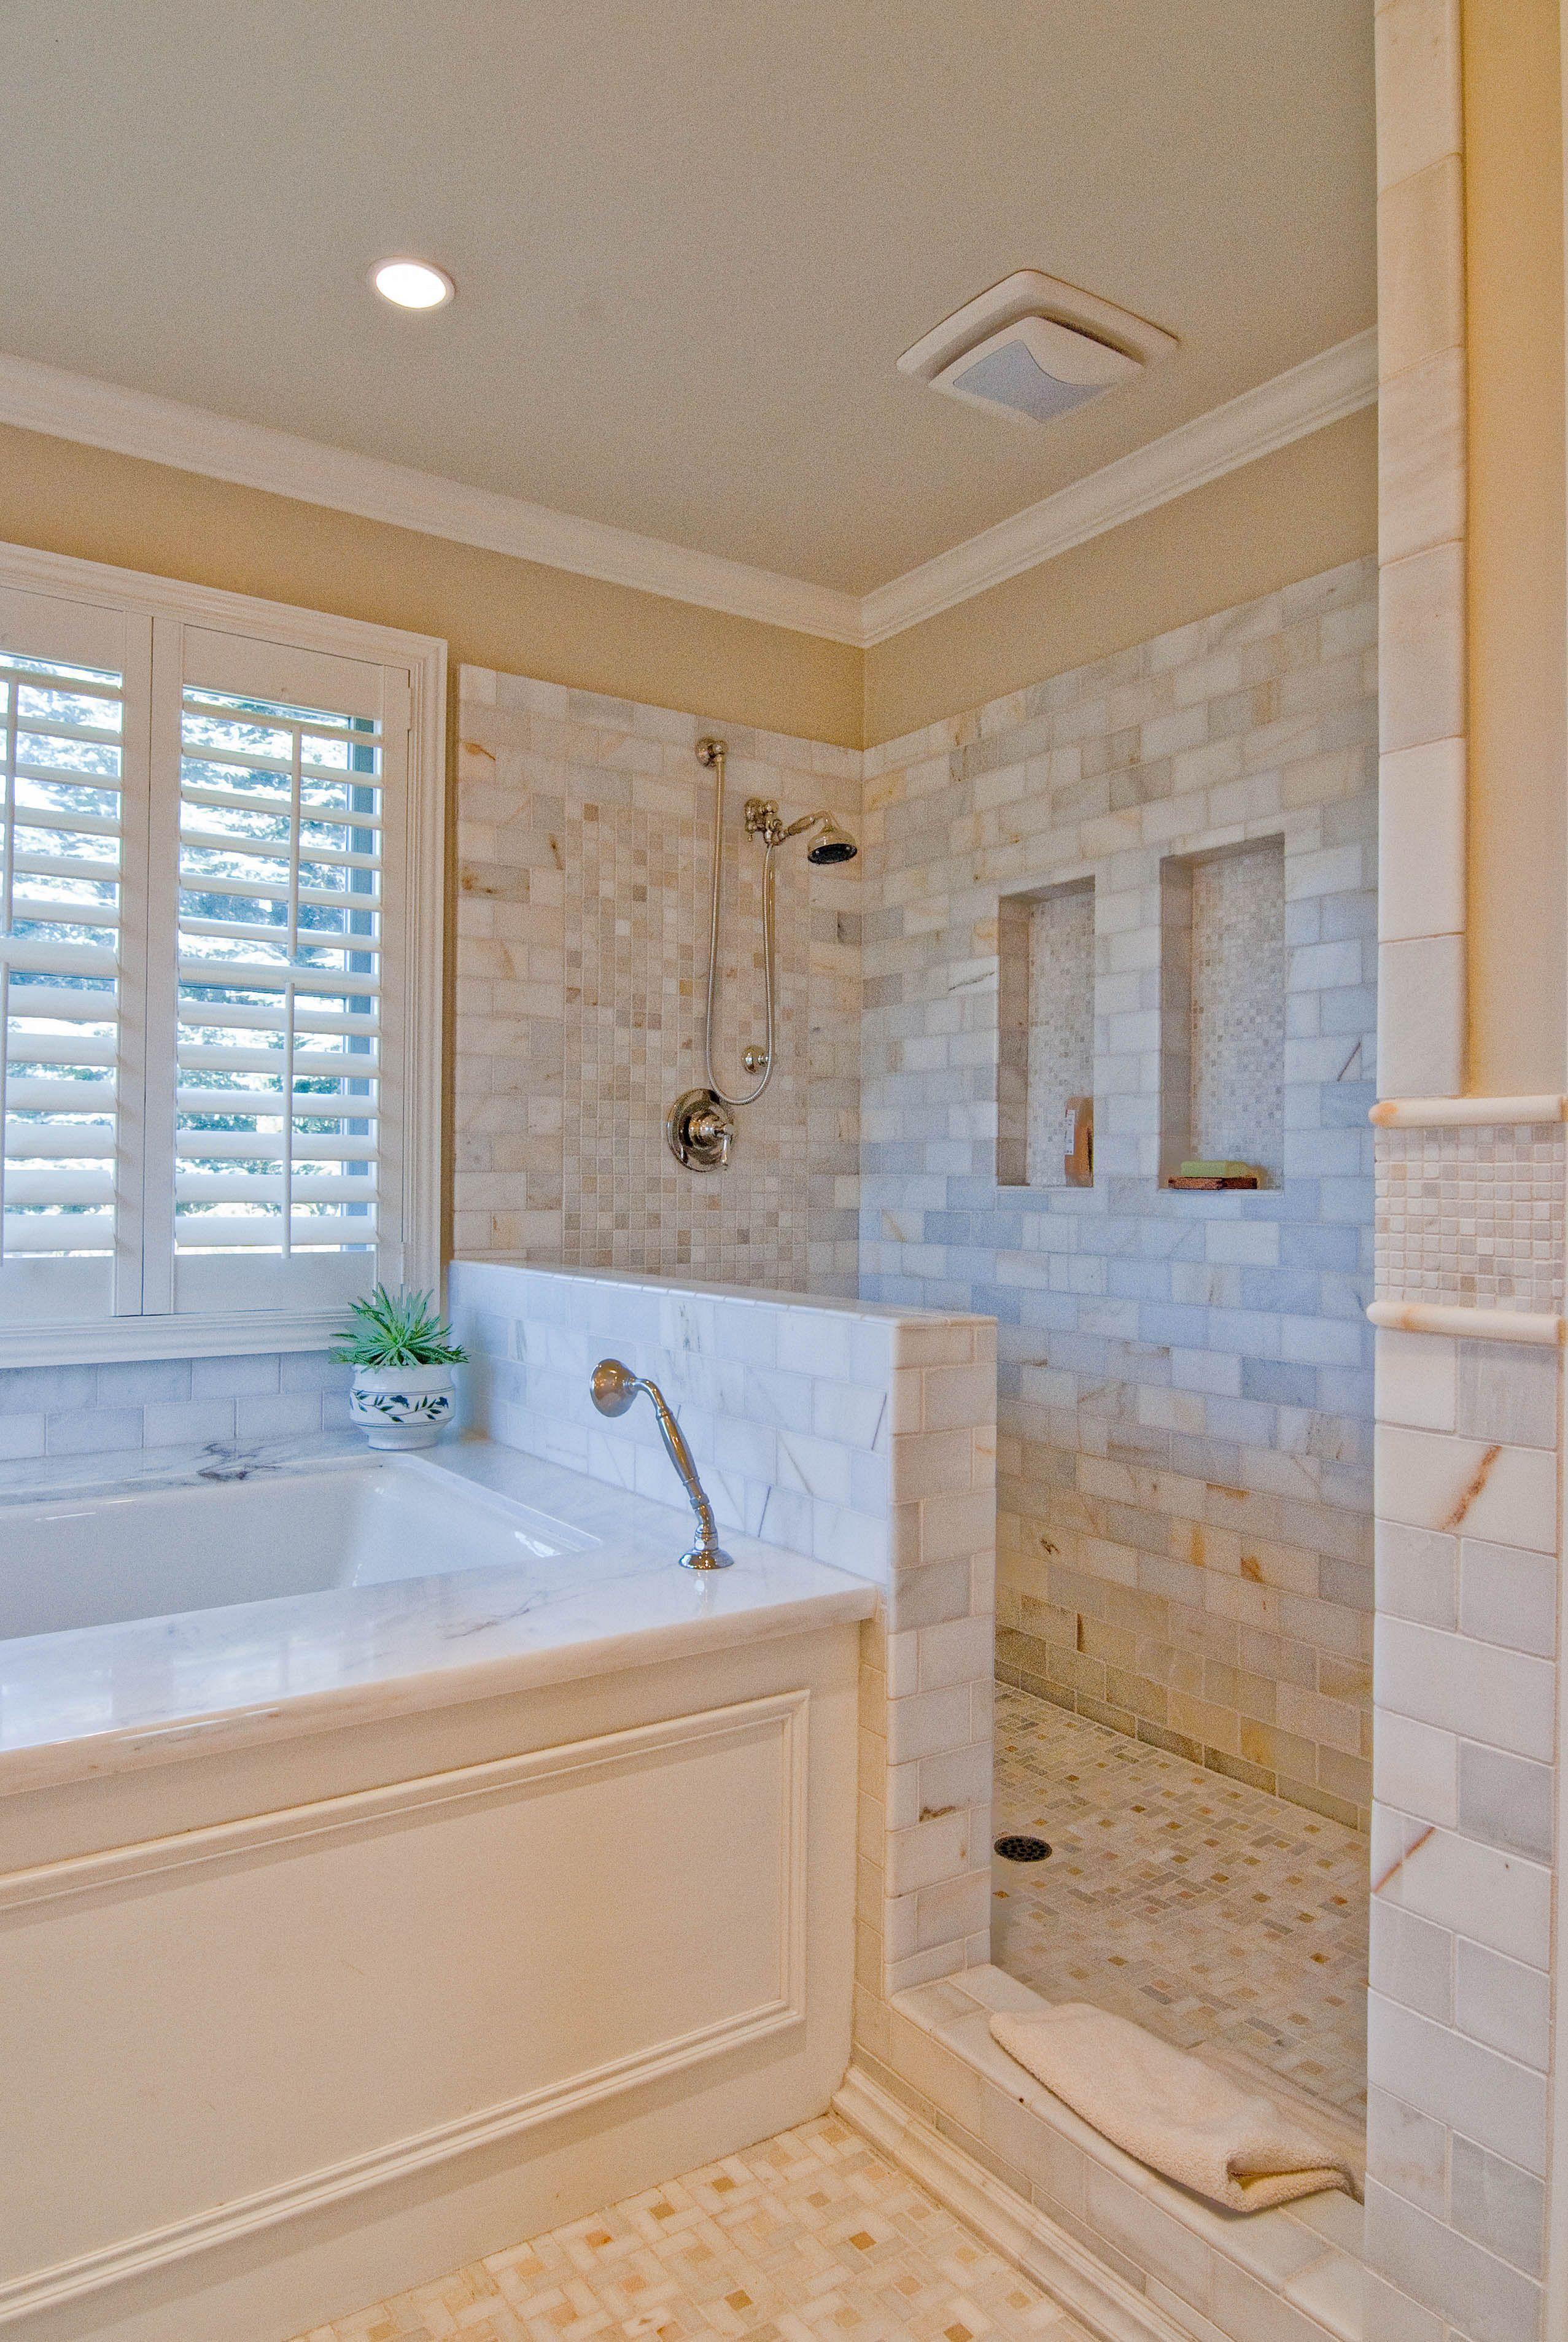 The Best Diy Master Bathroom Ideas Remodel On A Budget No 05 Design Decorating Master Bathroom Design Master Bedroom Bathroom Bathrooms Remodel